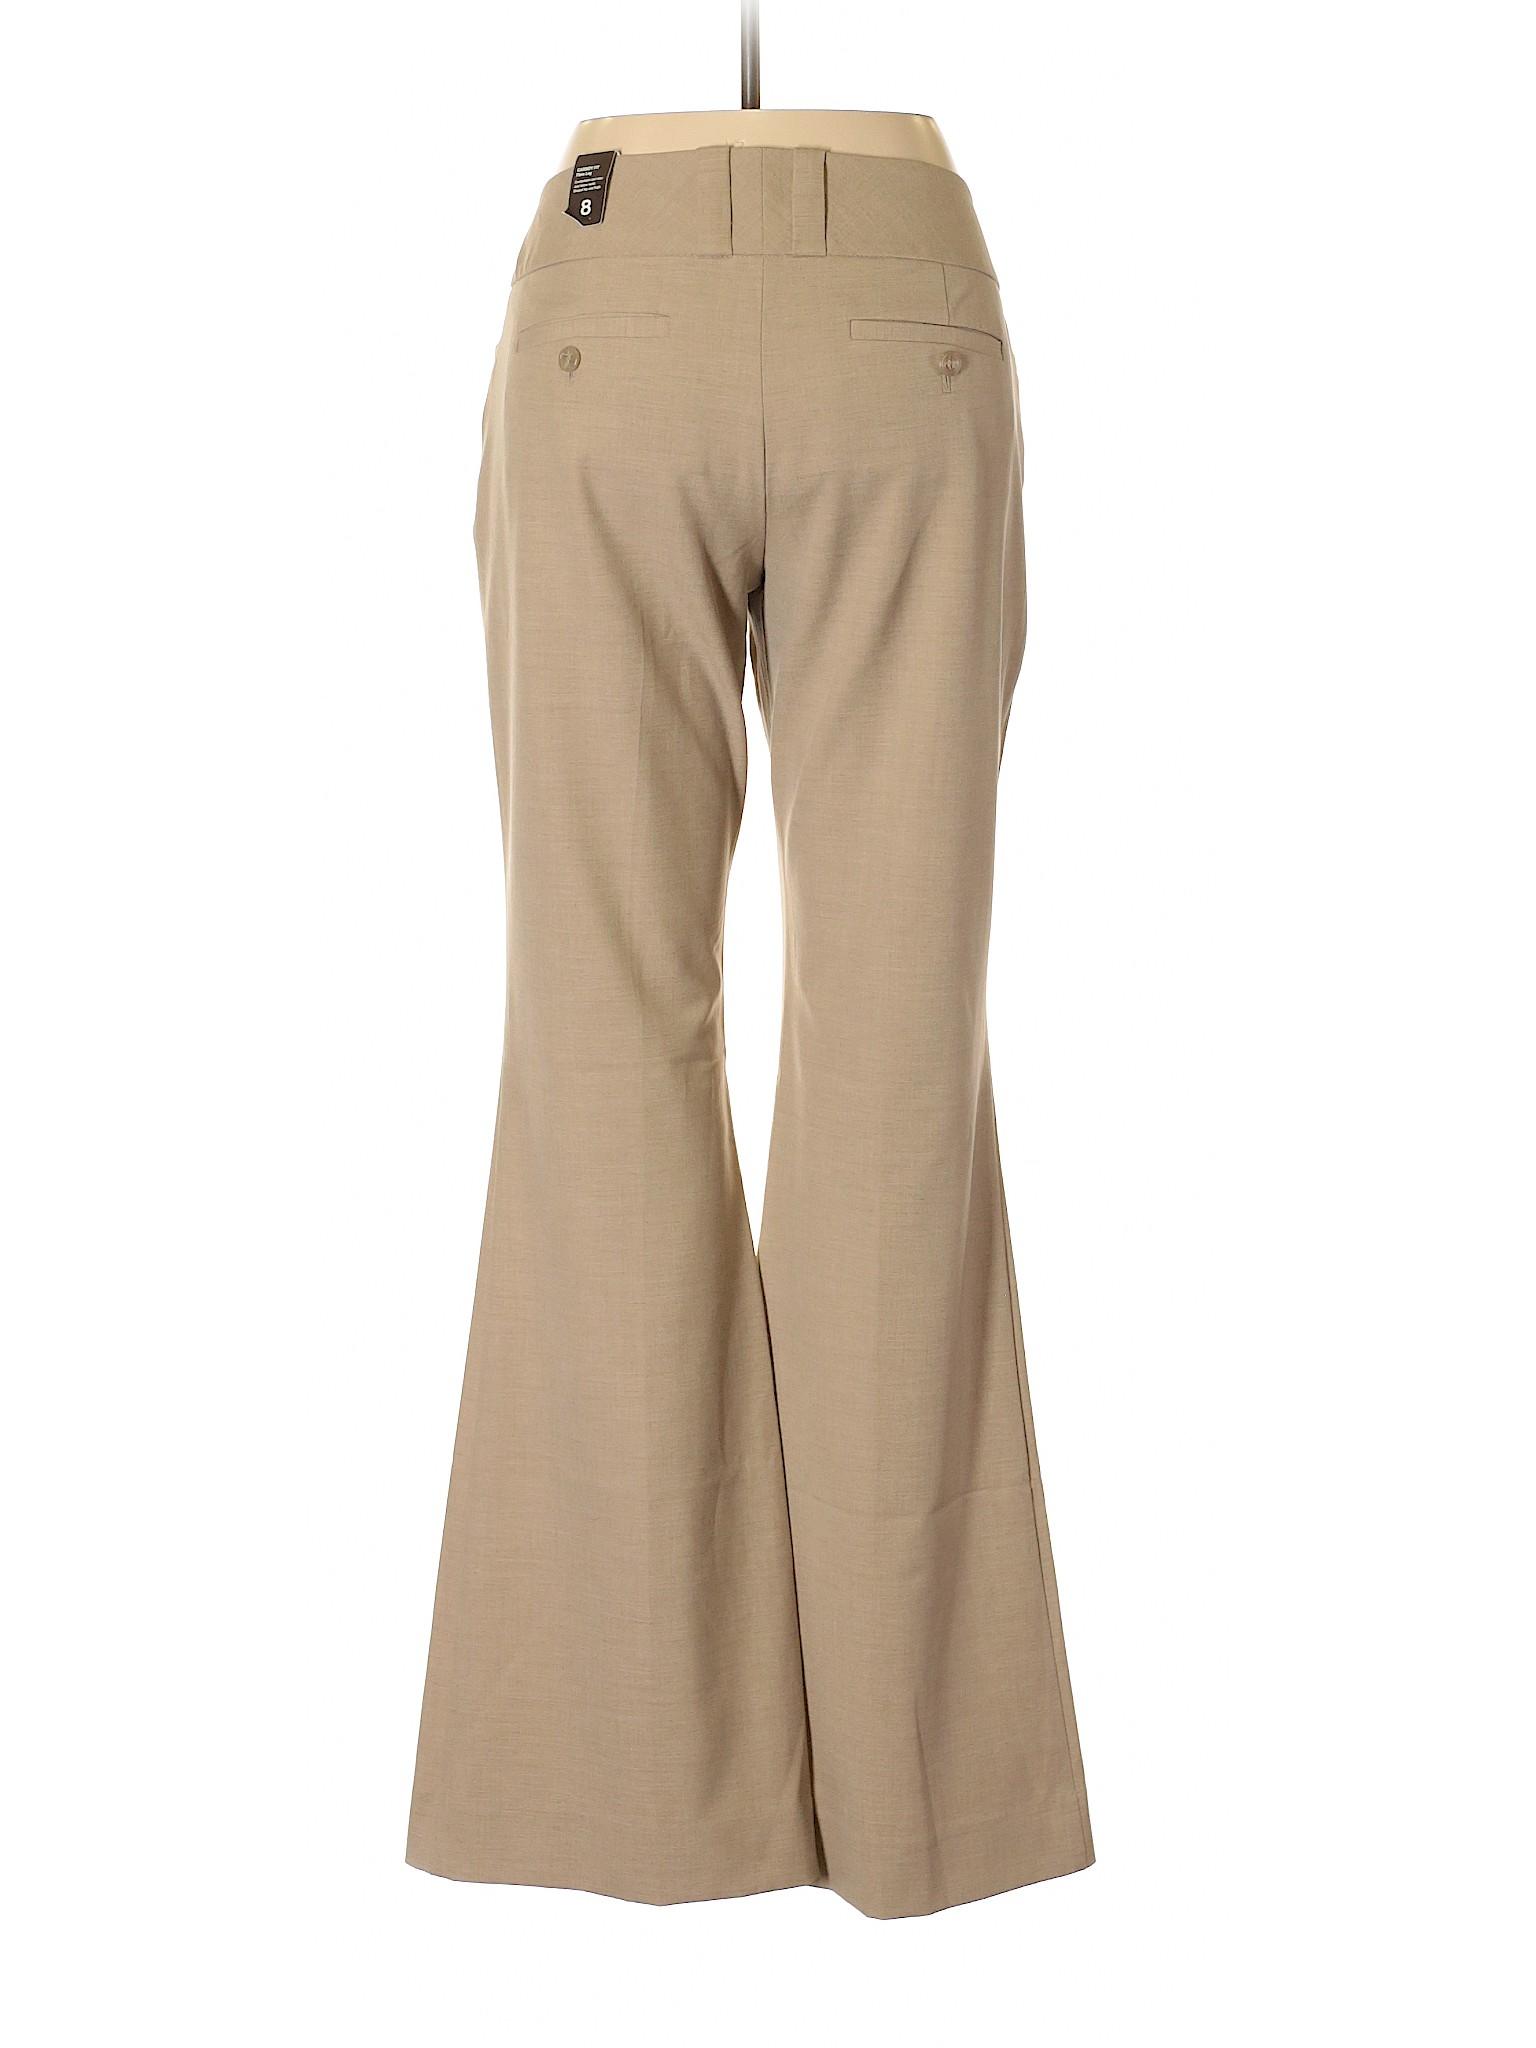 winter Dress Limited The Pants Boutique 4UqvwOv